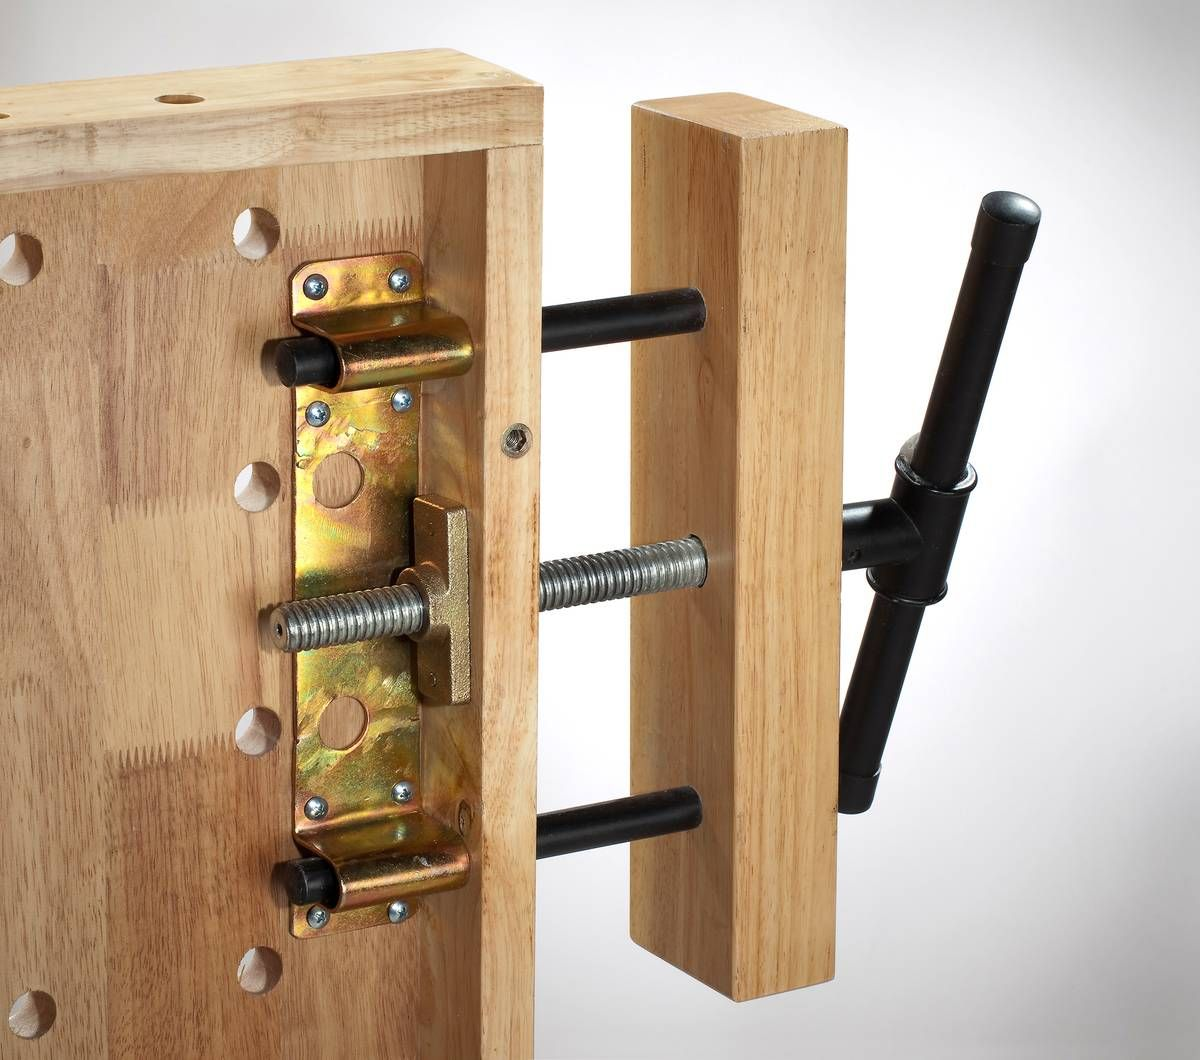 klemmvorrichtung f r hobelbank werktische pinterest hobelbank werkstatt und werkzeuge. Black Bedroom Furniture Sets. Home Design Ideas